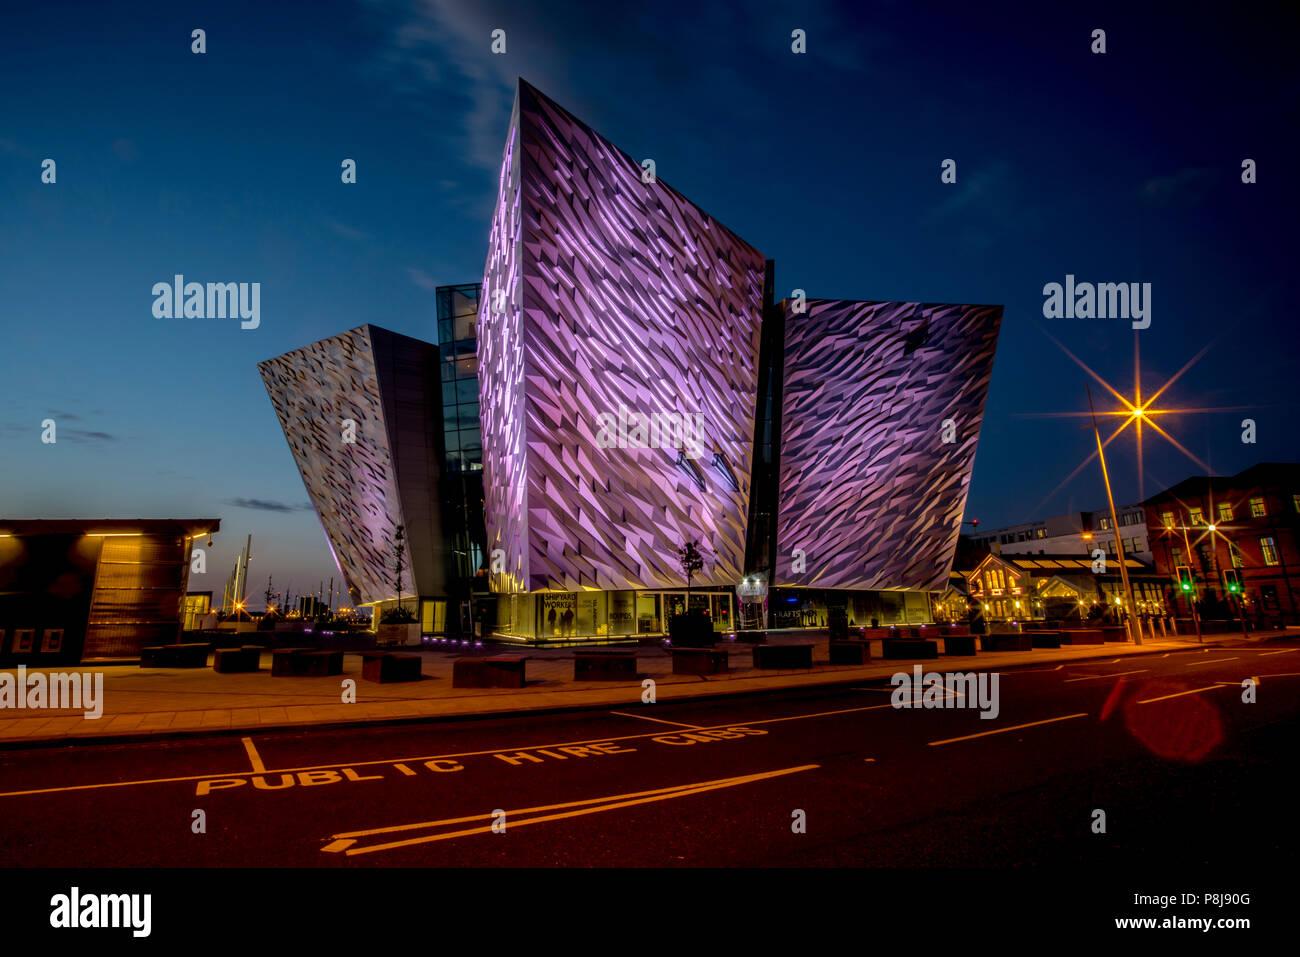 Titanic Museum, blue hour, architect Eric Kuhne, Titanic Quarter, Belfast, Northern Ireland, Great Britain - Stock Image